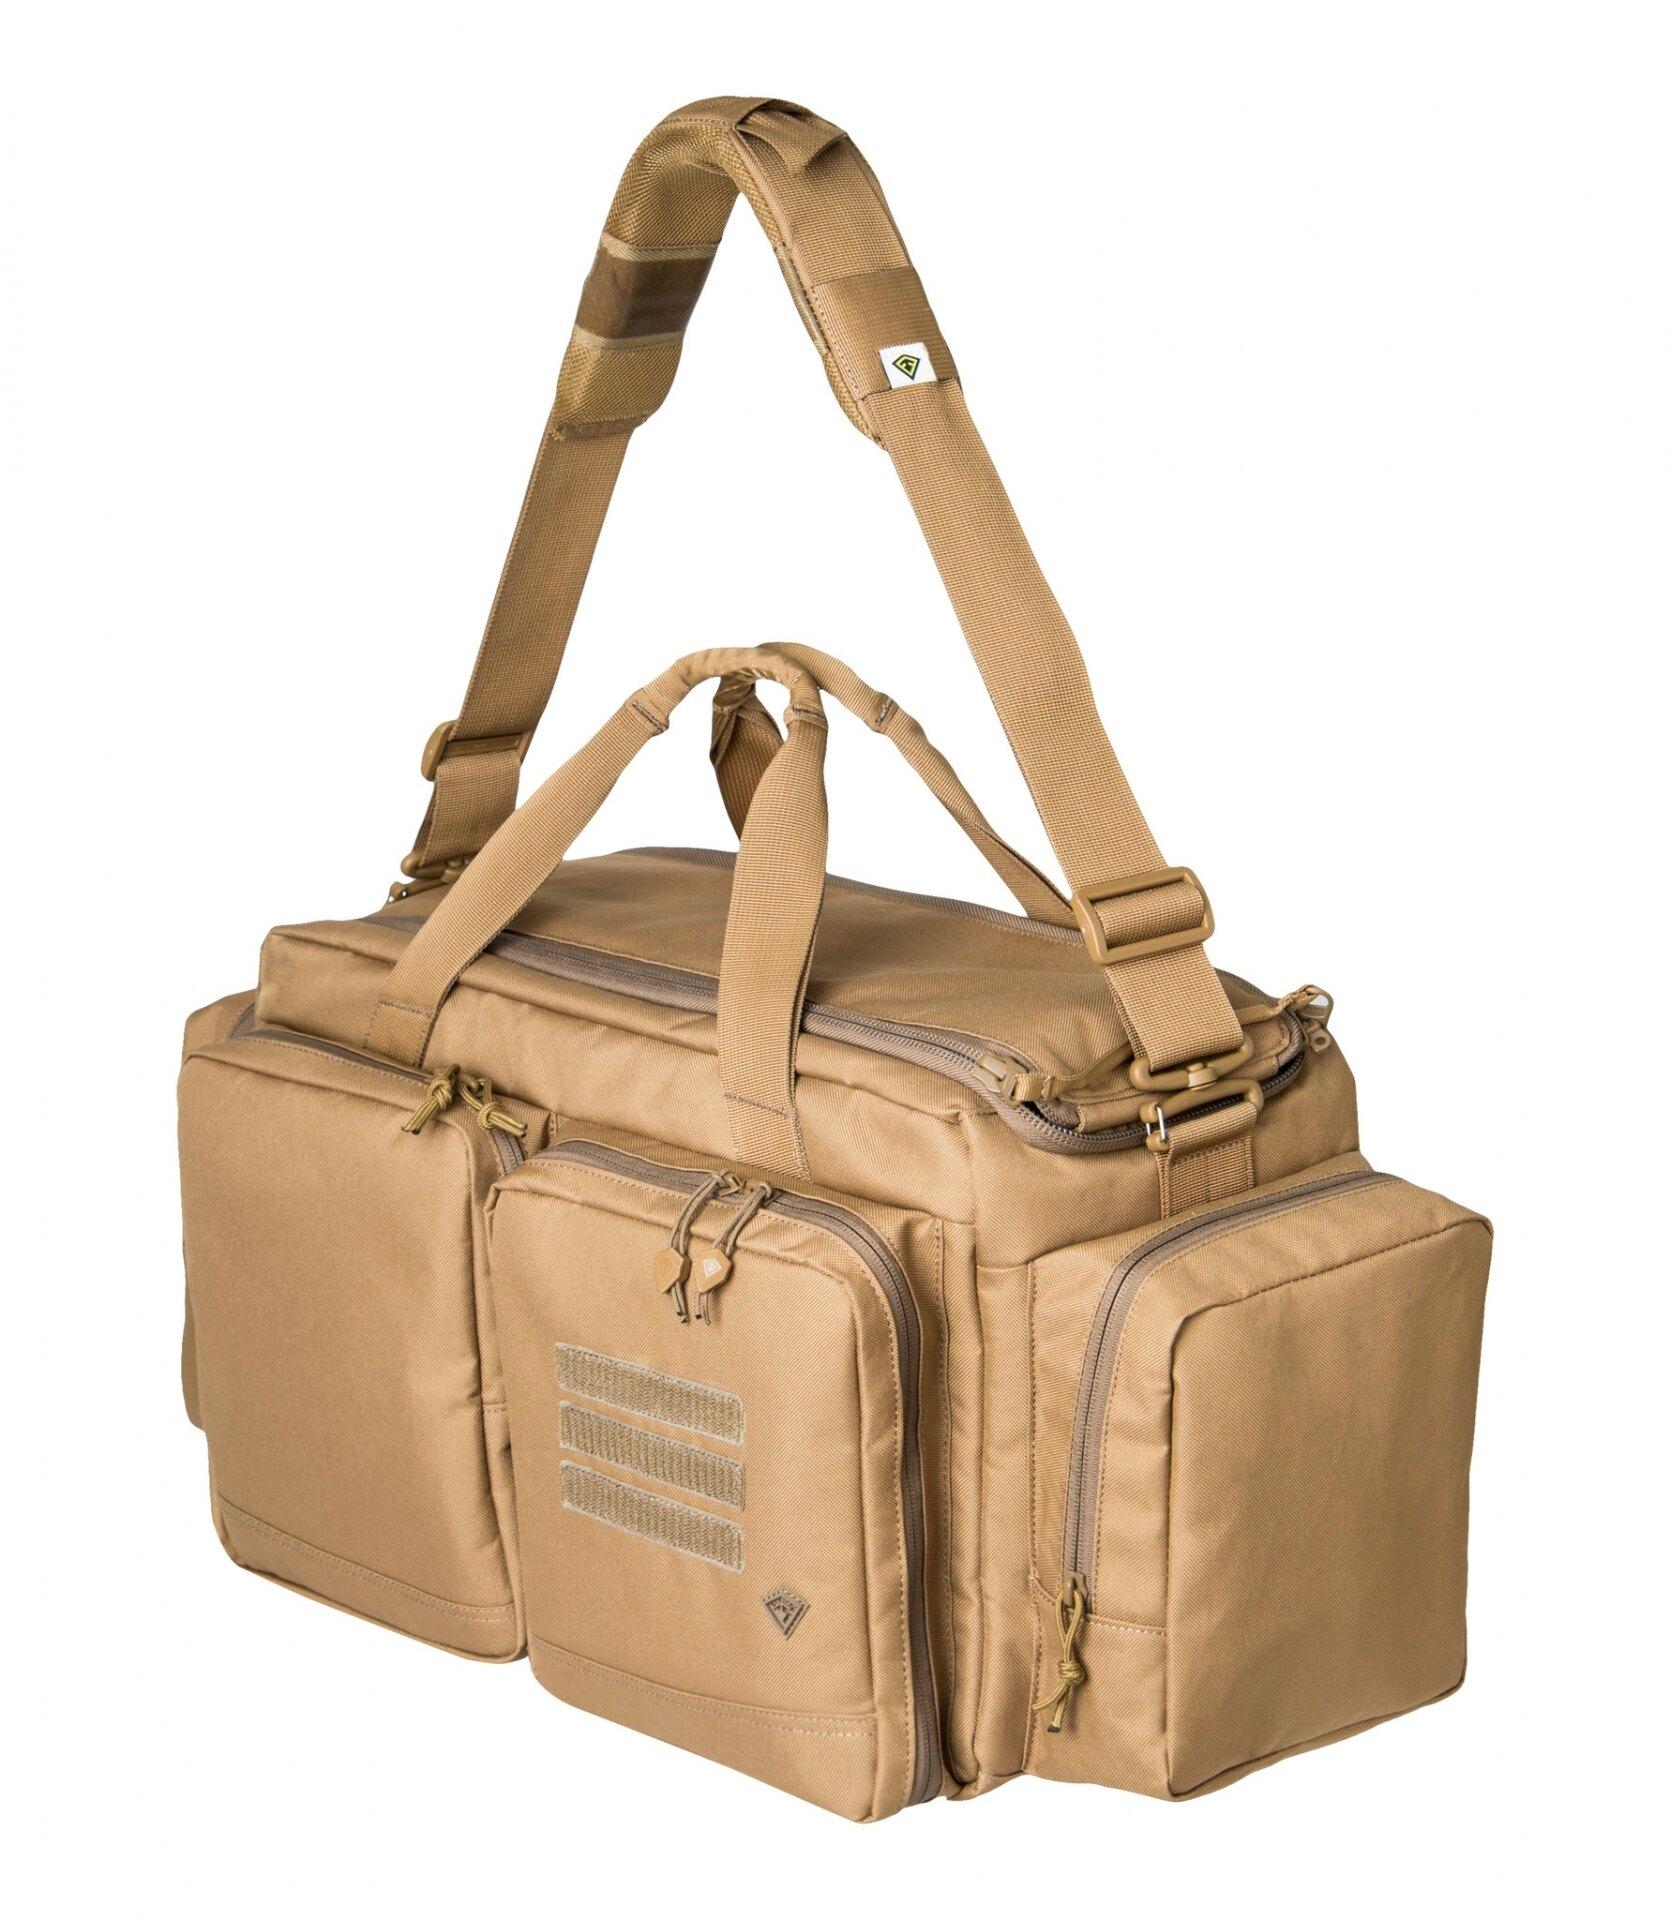 Strelecká taška First Tactical® Recoil Range - coyote (Farba: Coyote)